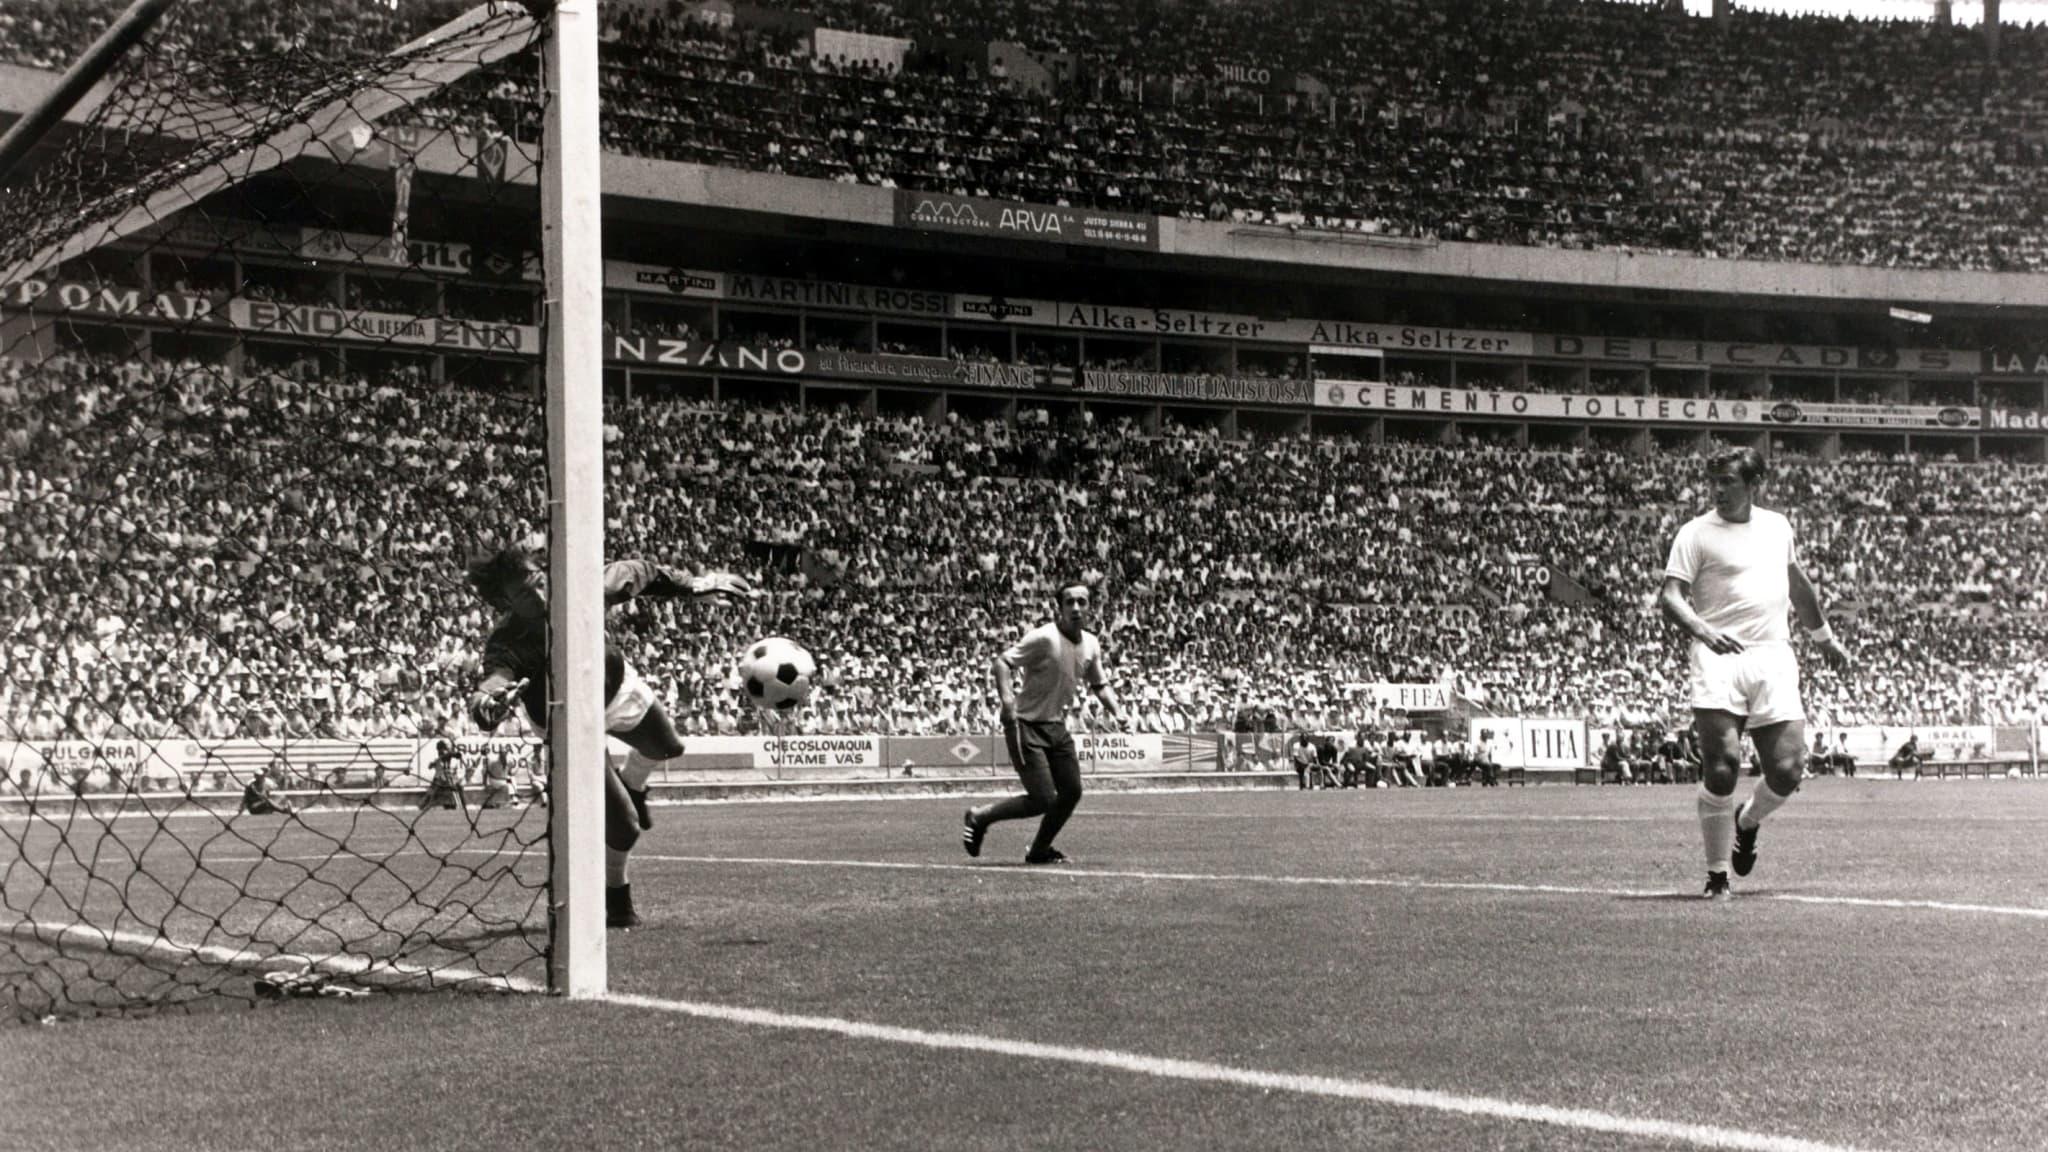 انگلیس / جام جهانی 1970 / برزیل / Brazil / England / 1970 World Cup